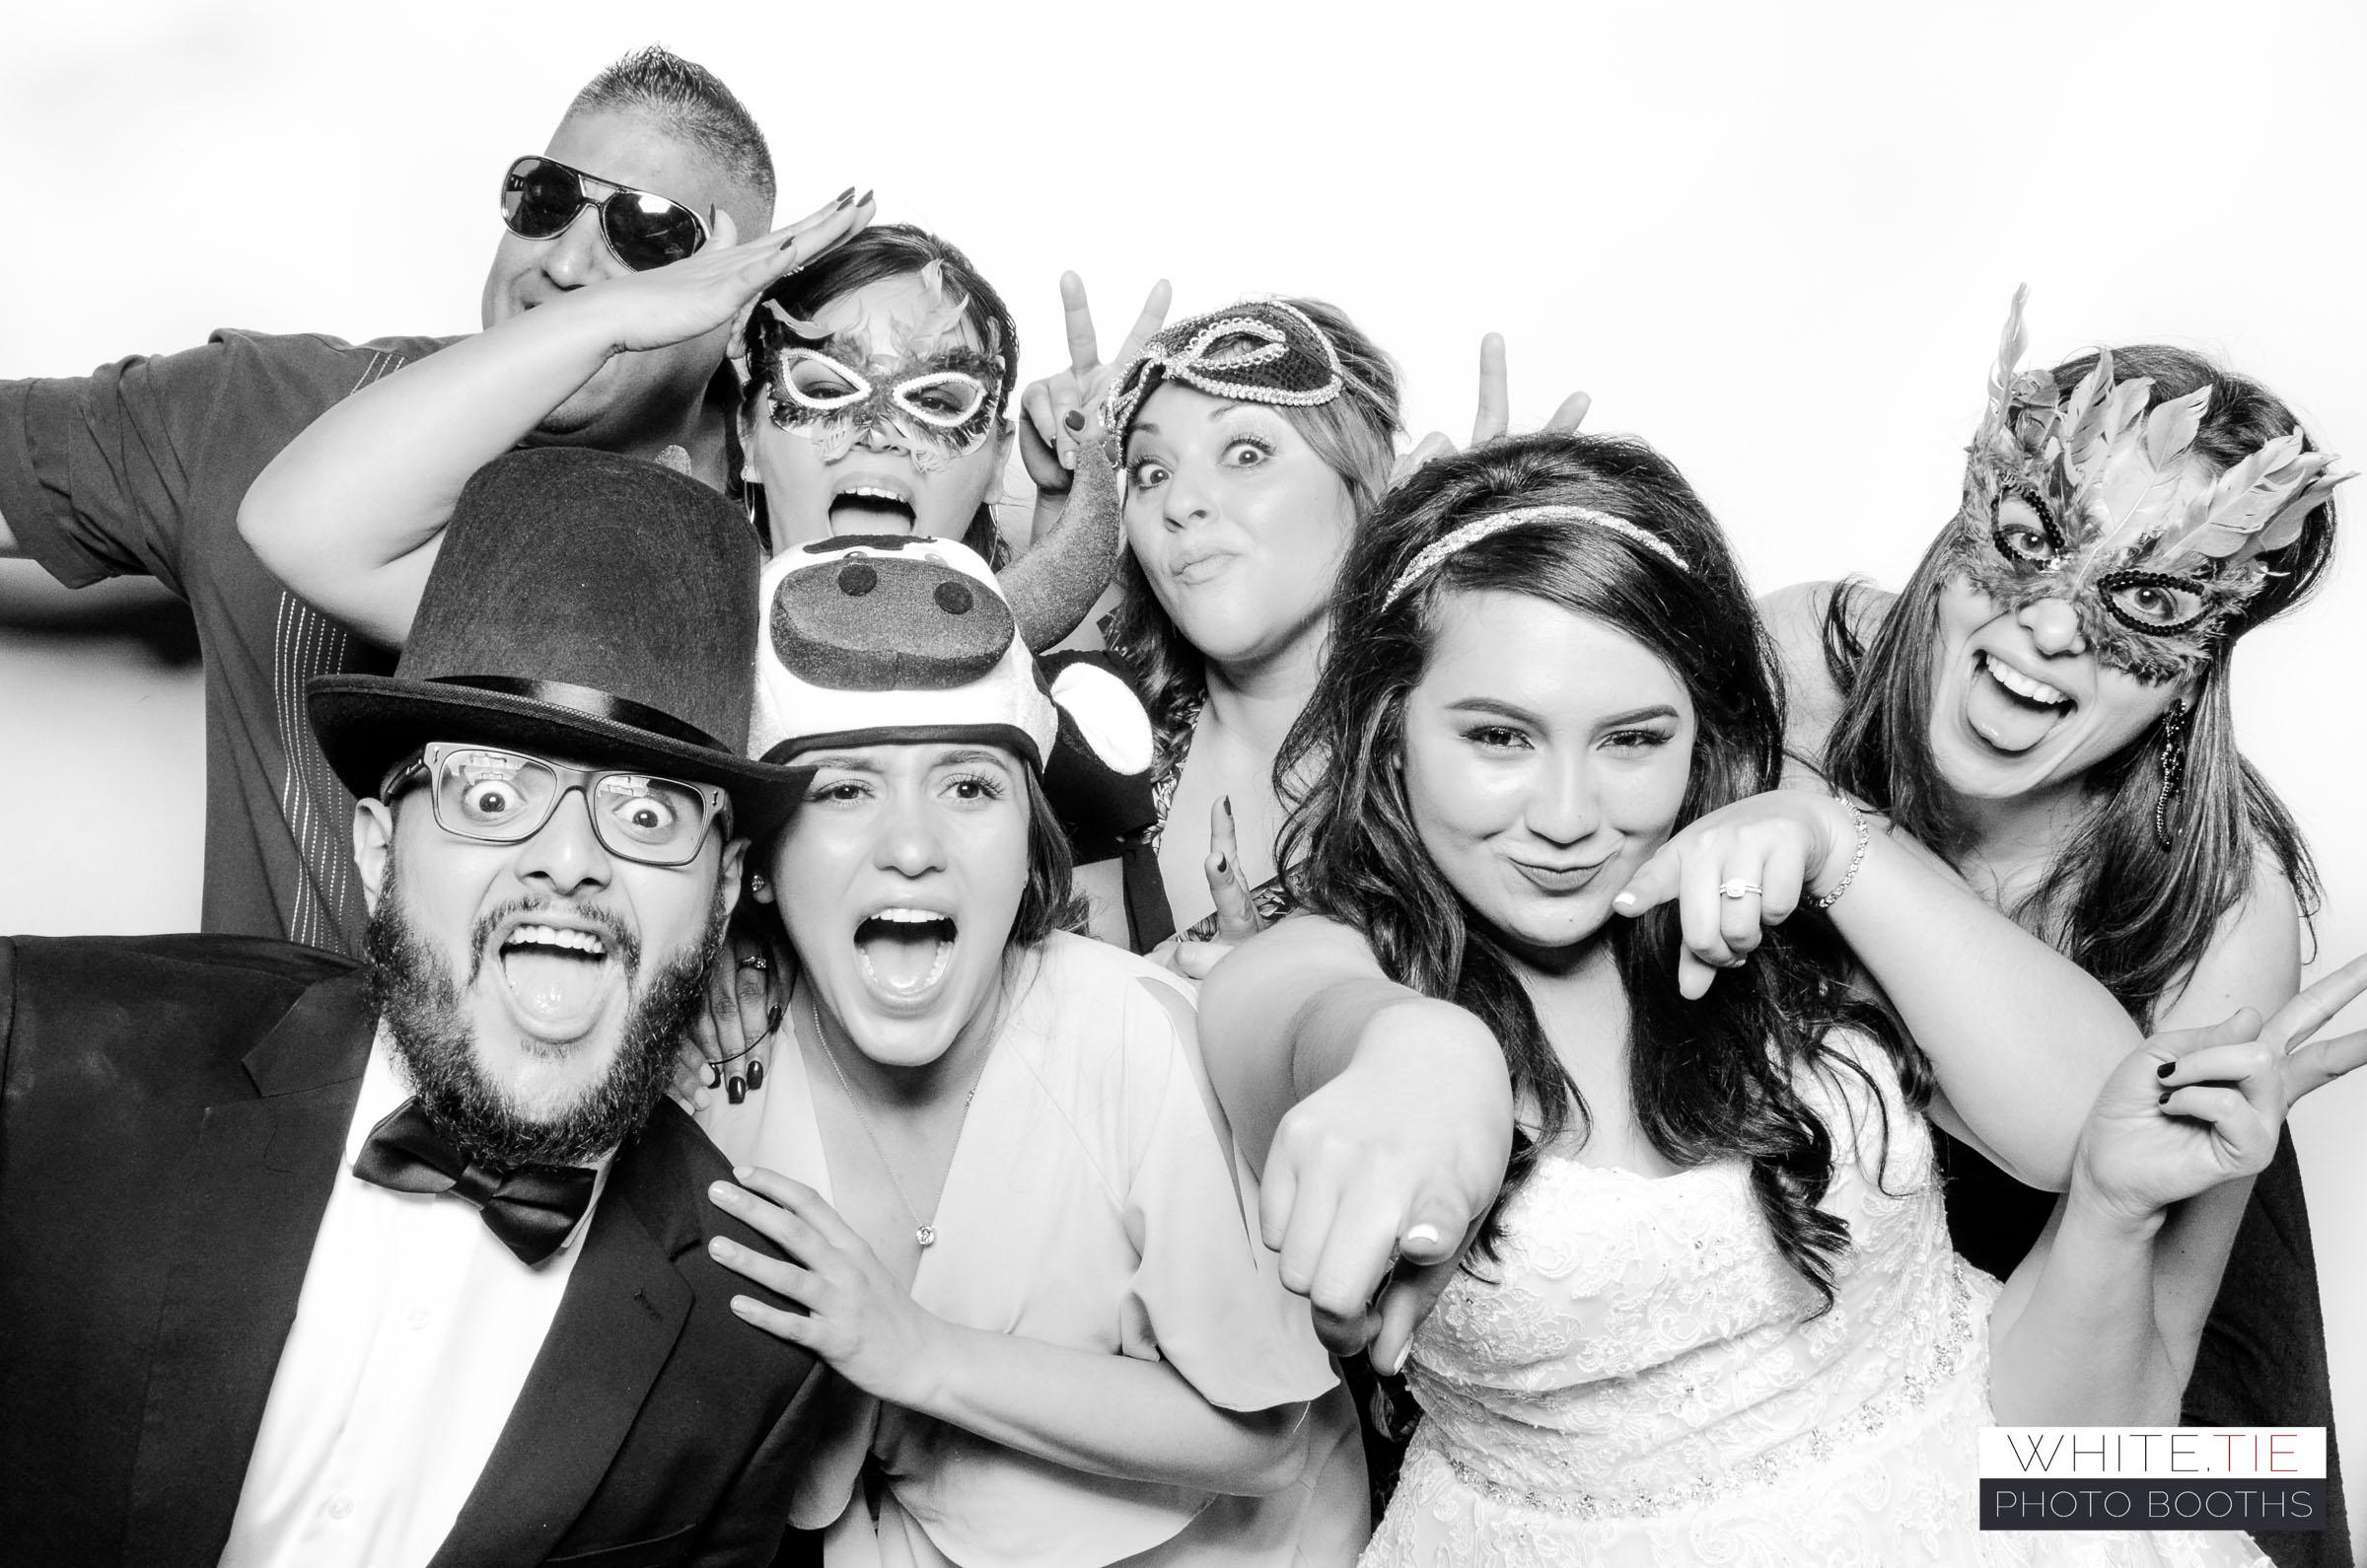 Yuma Wedding Photo Booth